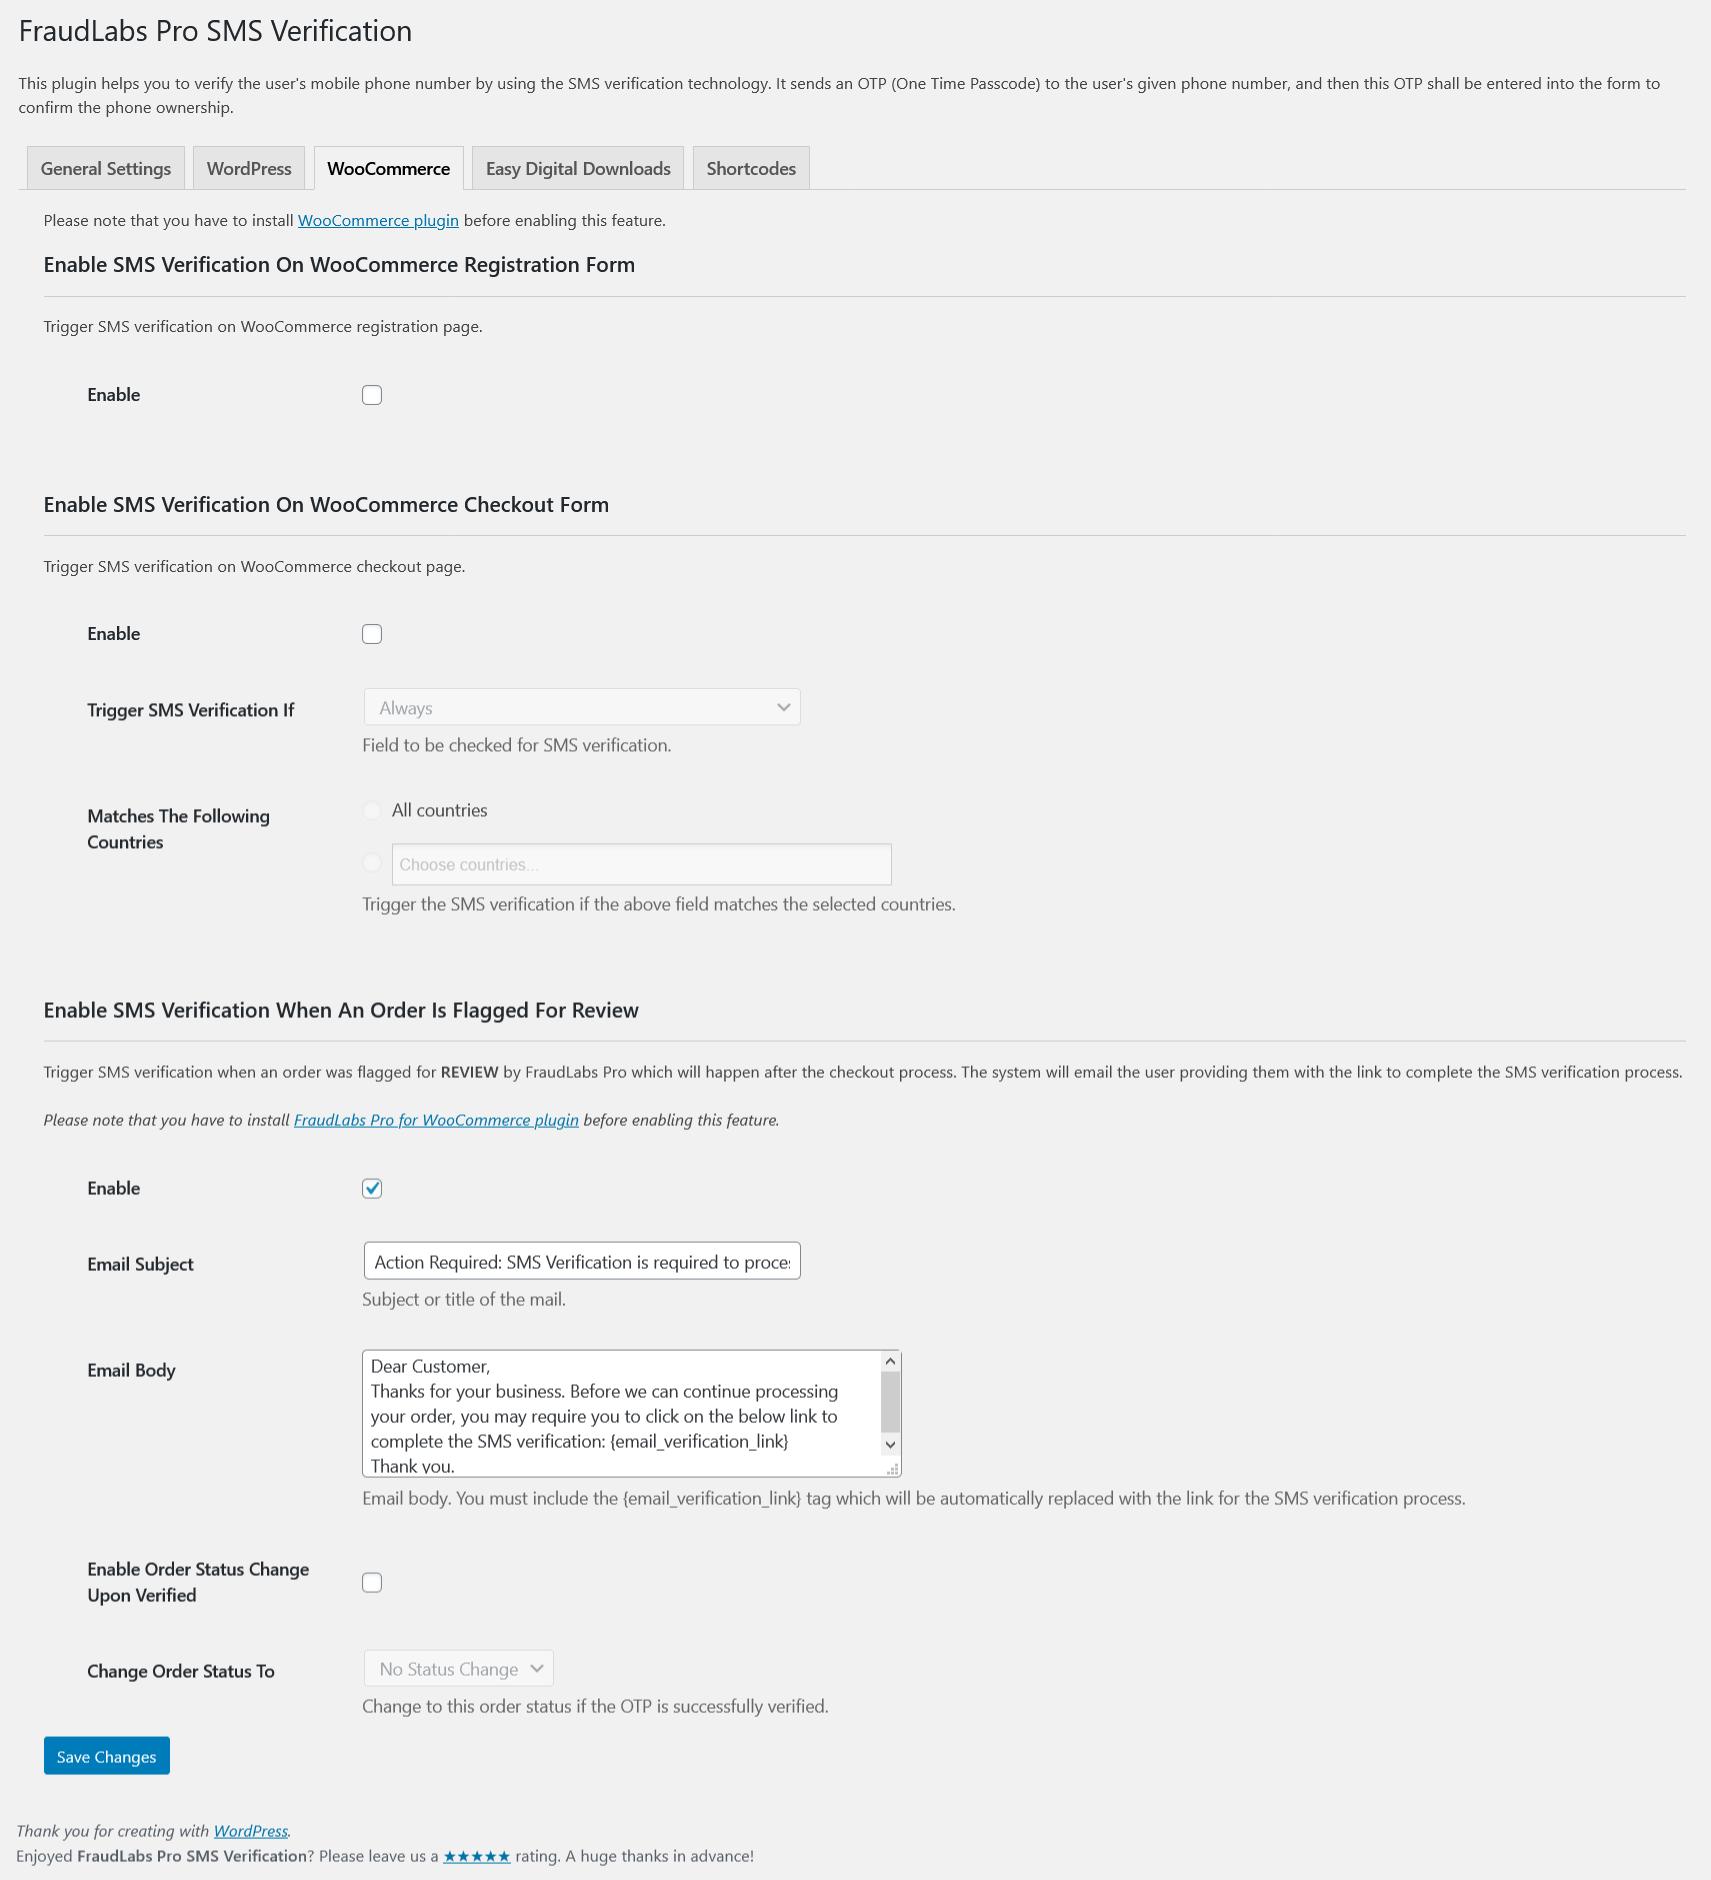 FraudLabs Pro SMS Verification